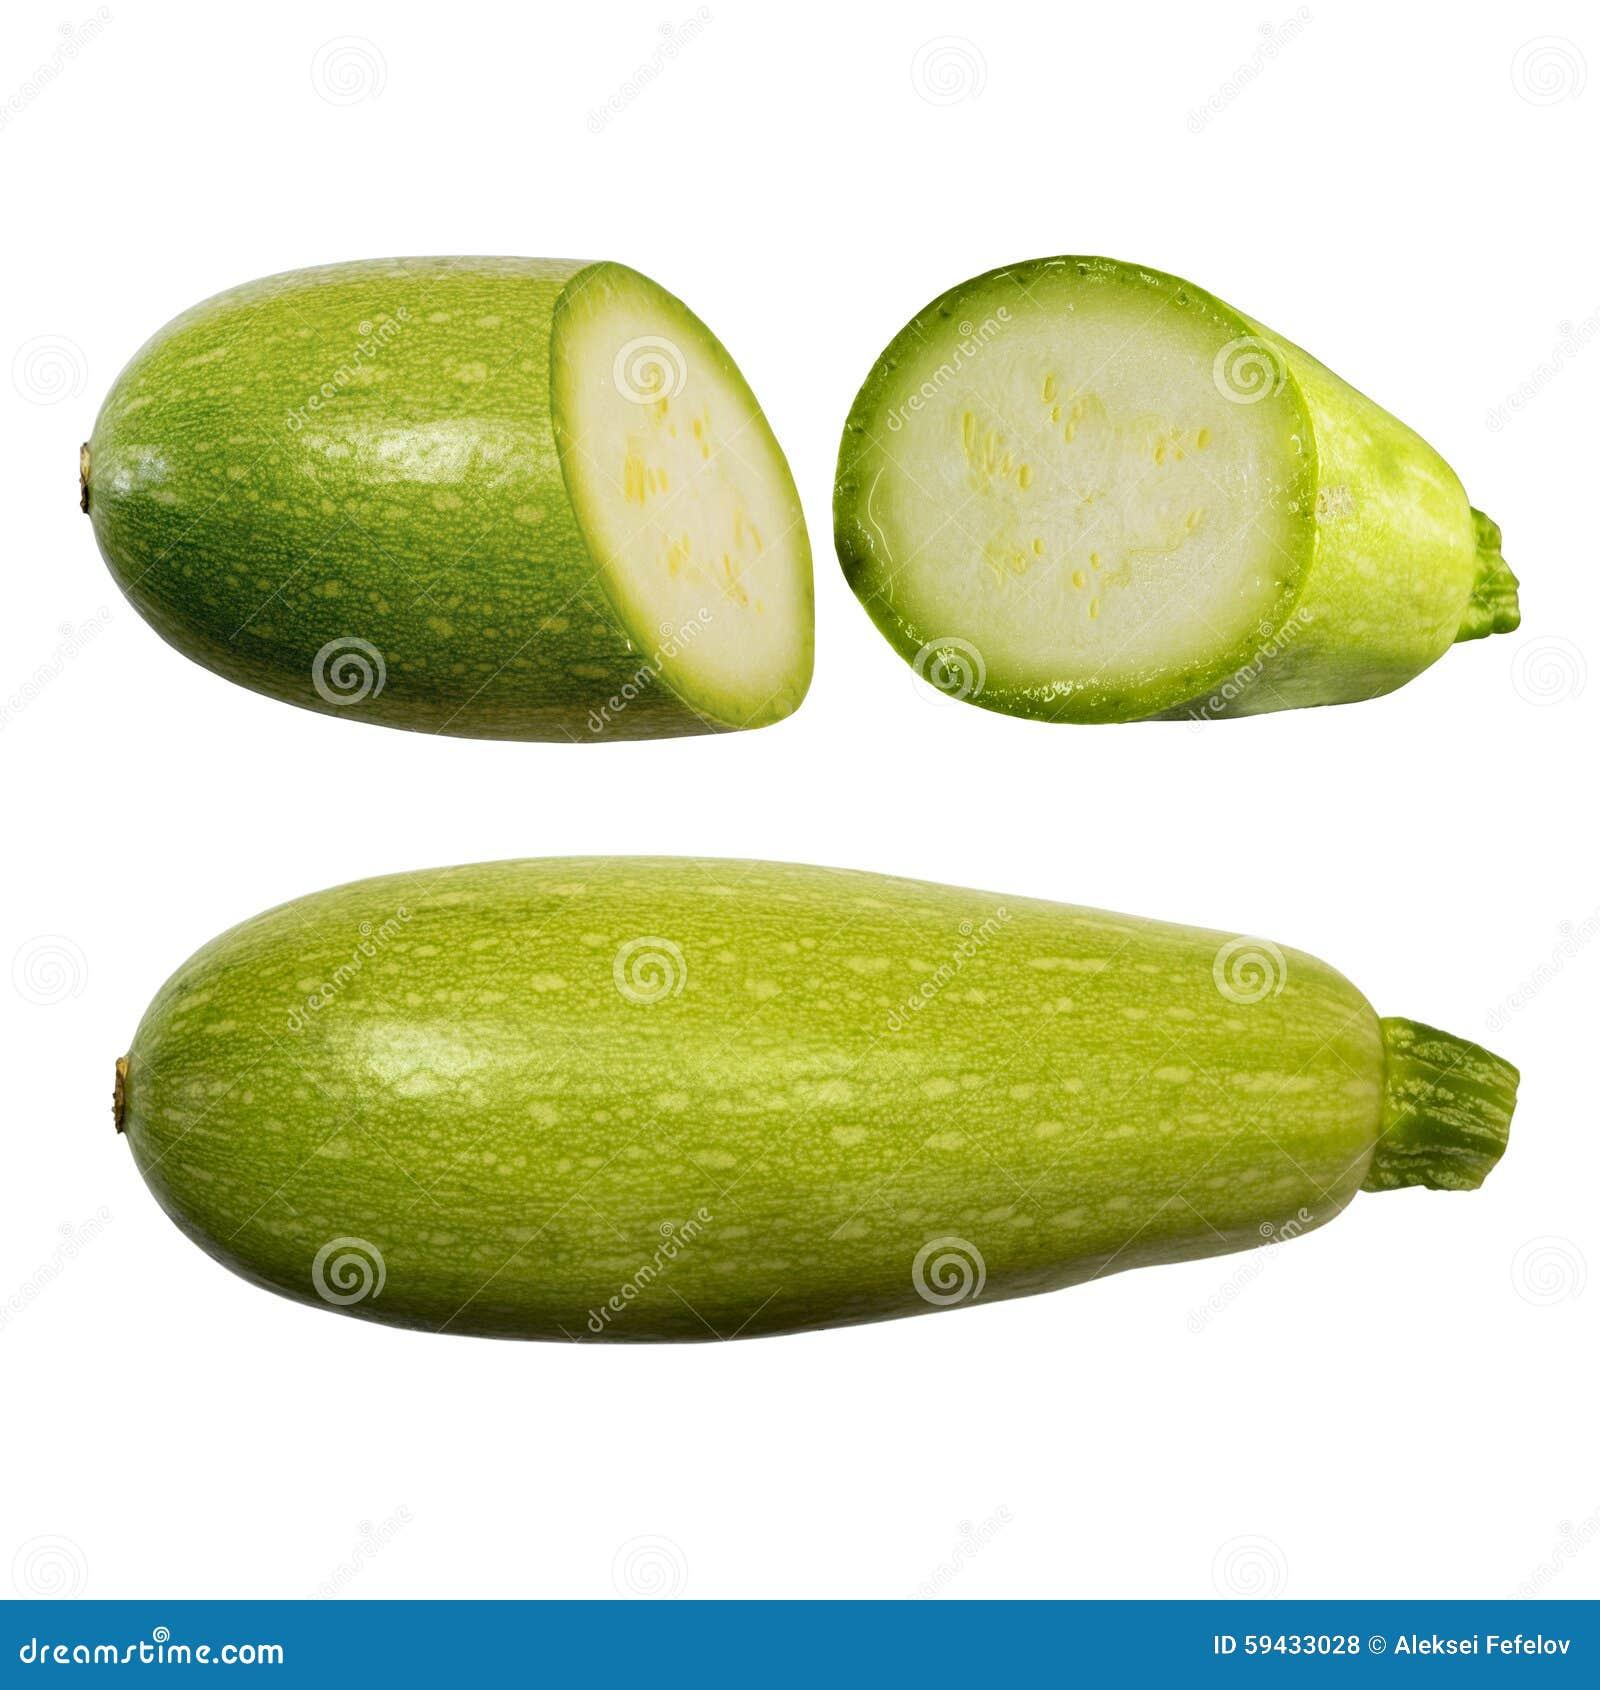 squash vegetable marrow isolated on white background